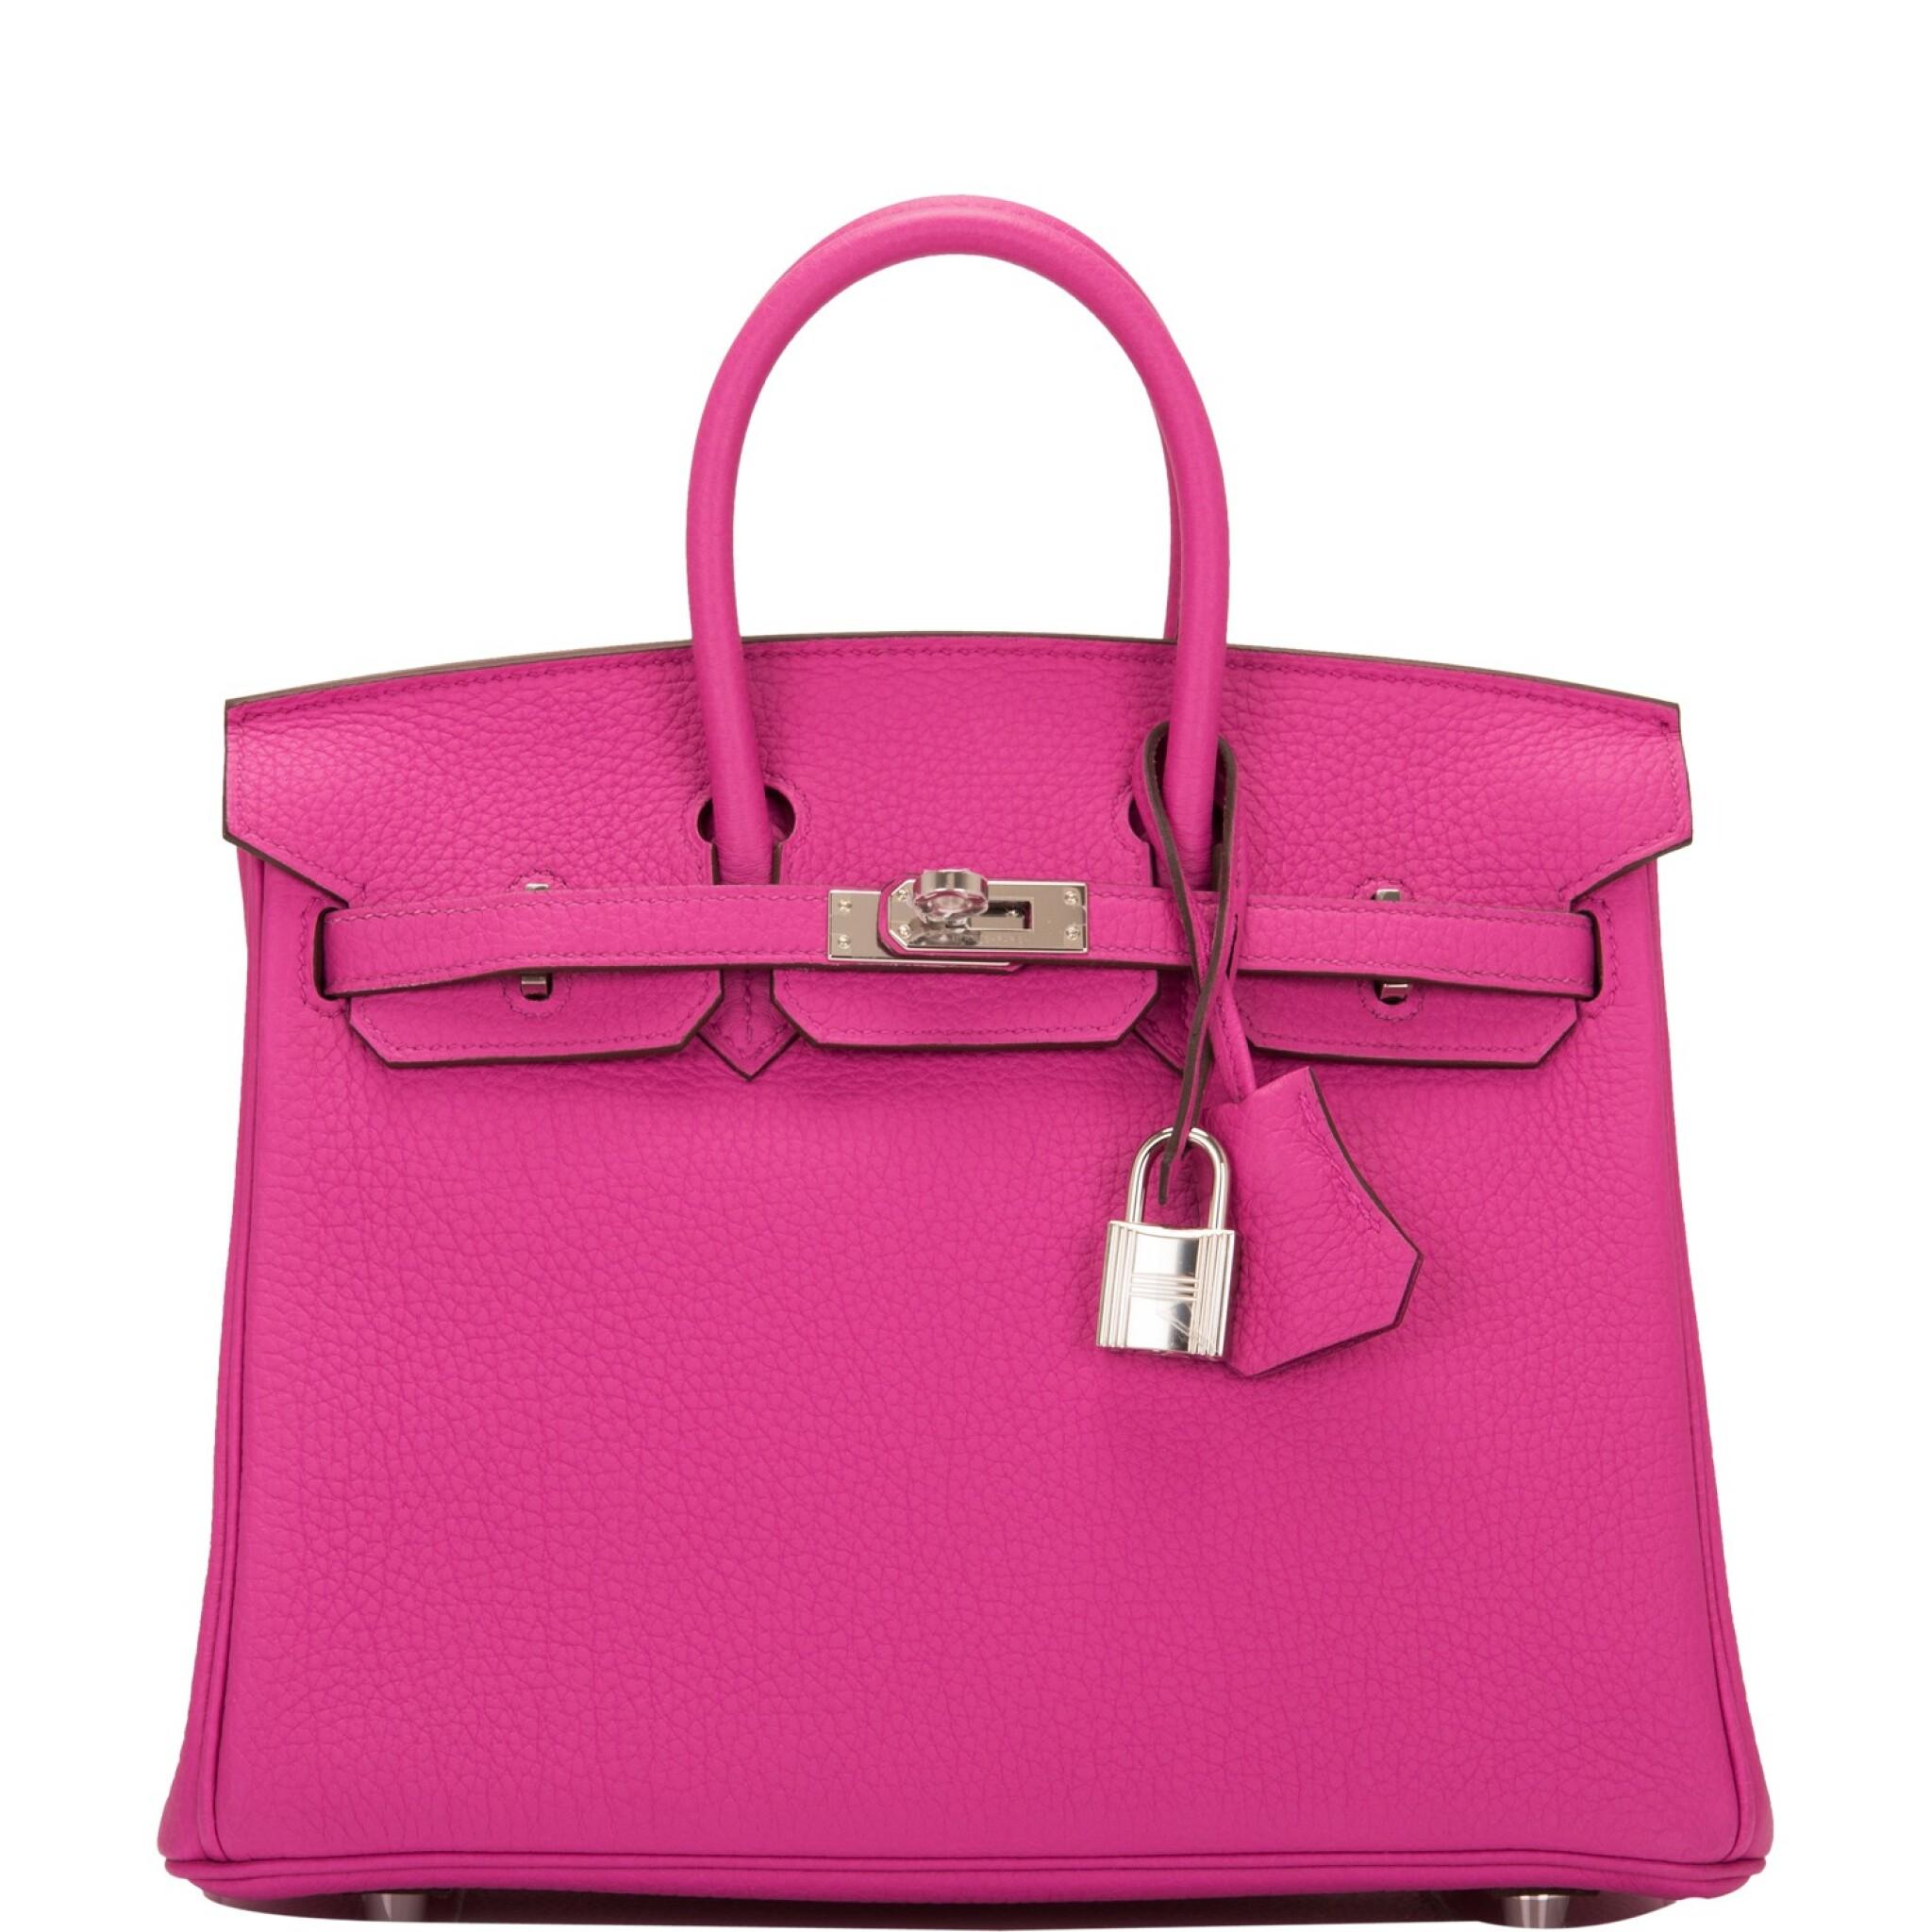 View full screen - View 1 of Lot 4. Hermès Magnolia Togo Birkin 25cm Palladium Hardware.